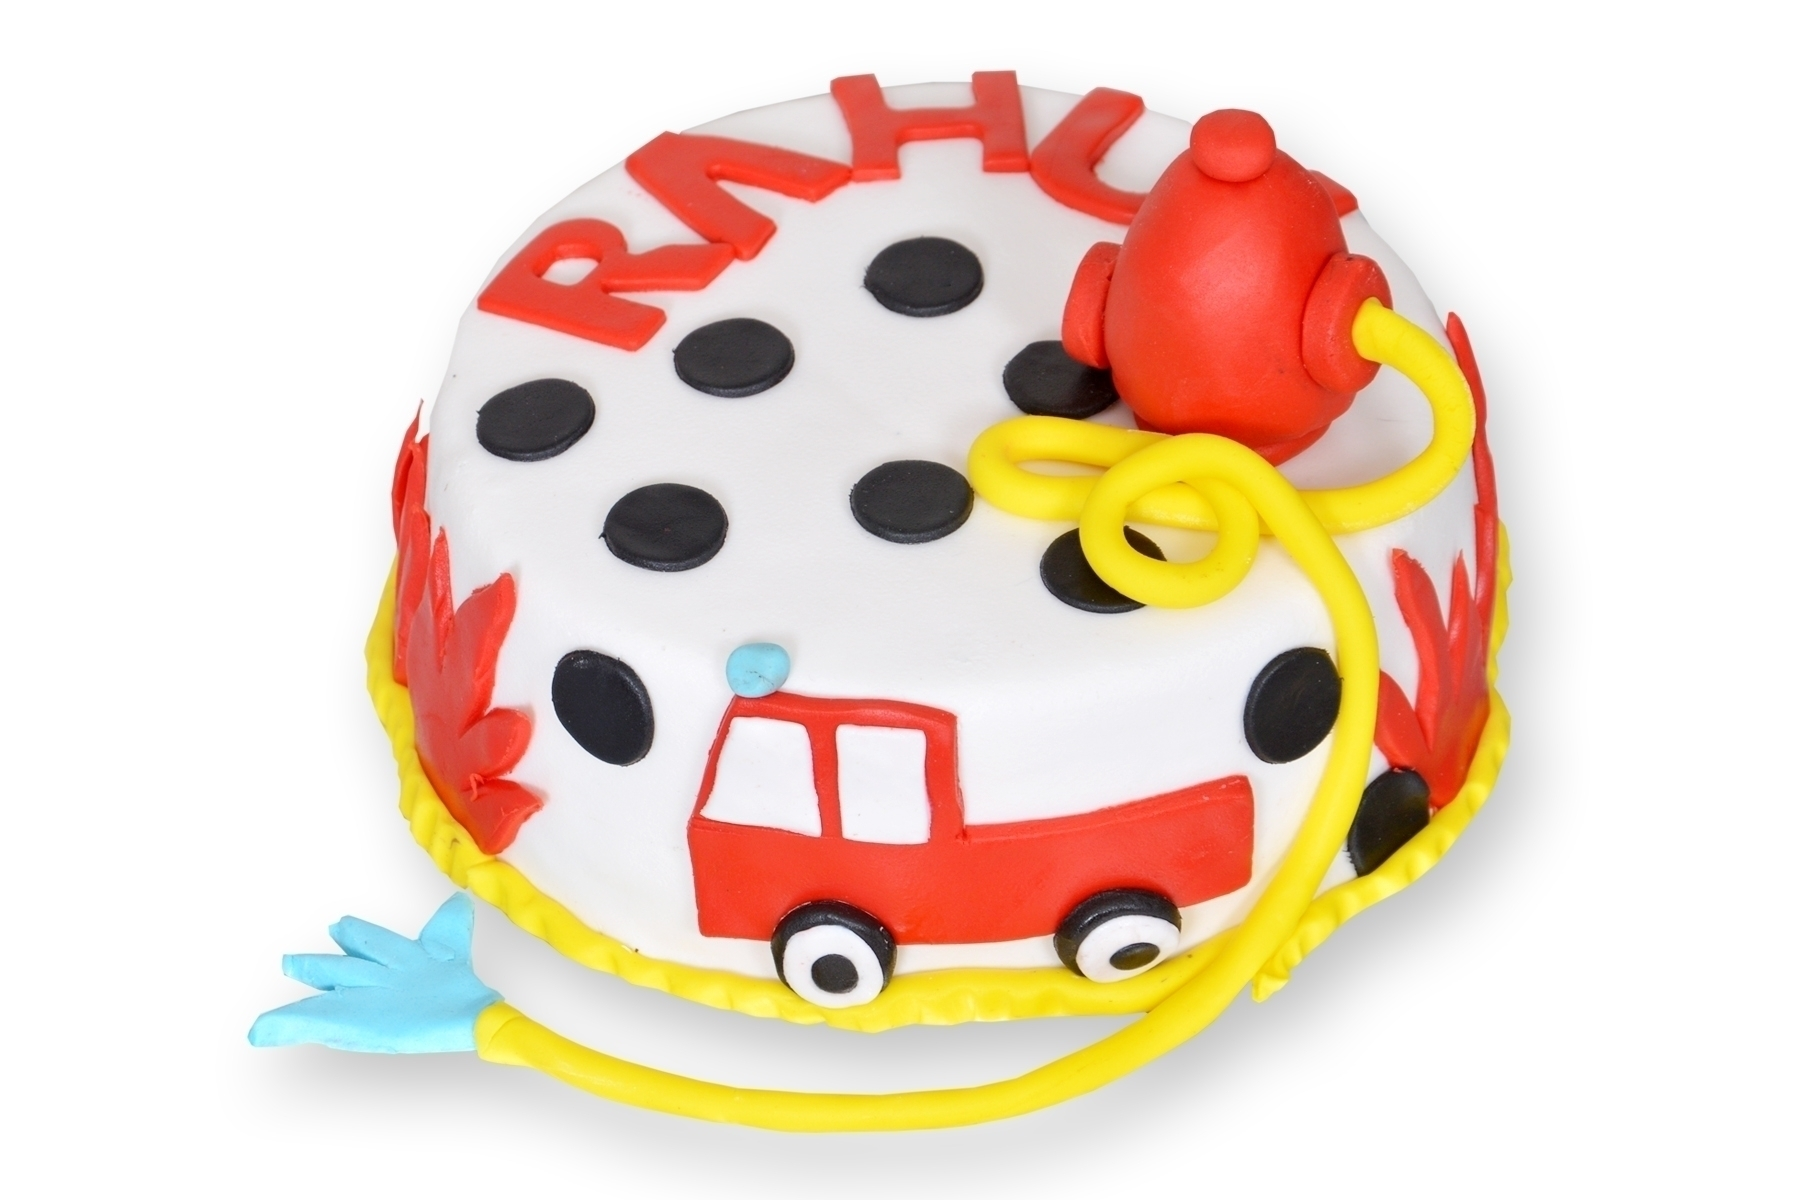 Fire Brigade Cake (Semi Fondant) in Pune Designs, Images, Price